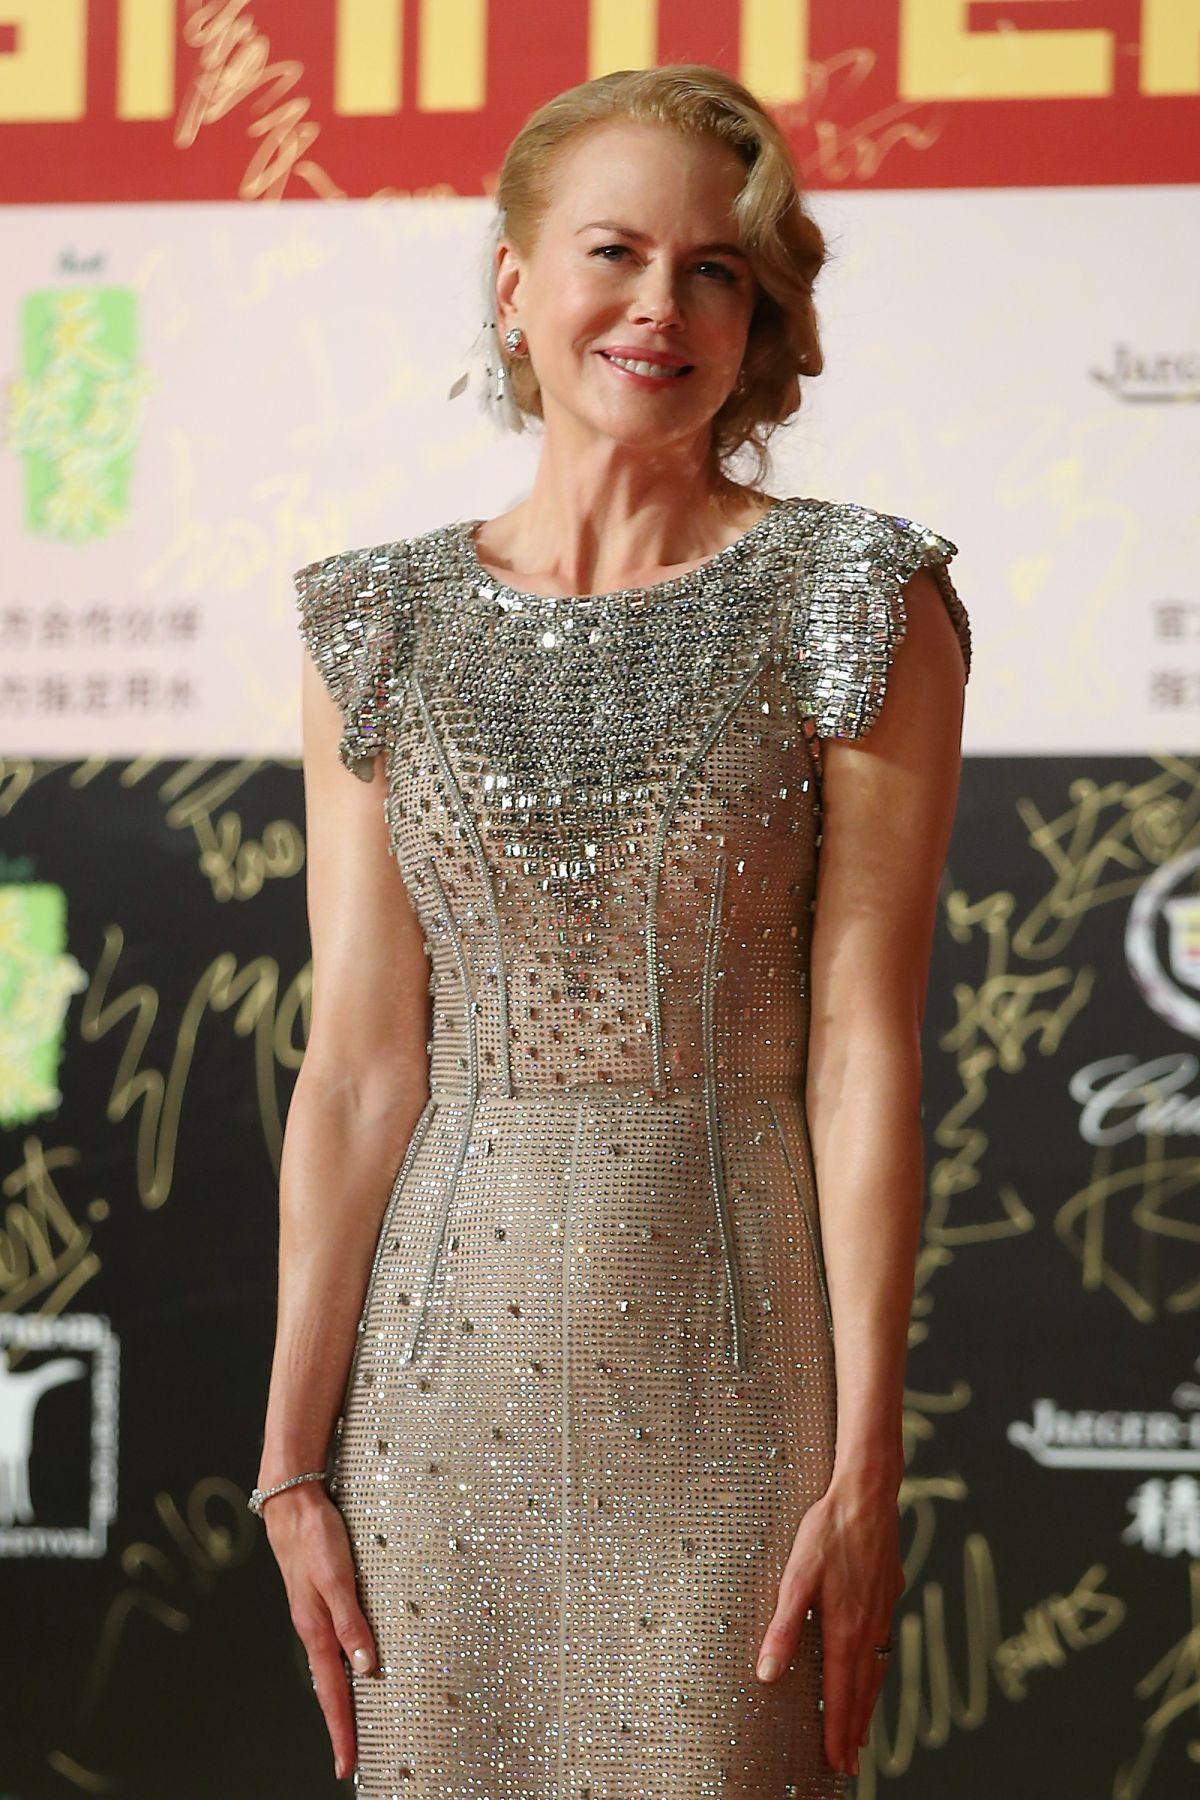 NICOLE KIDMAN at 2014 Shanghai International Film Festival